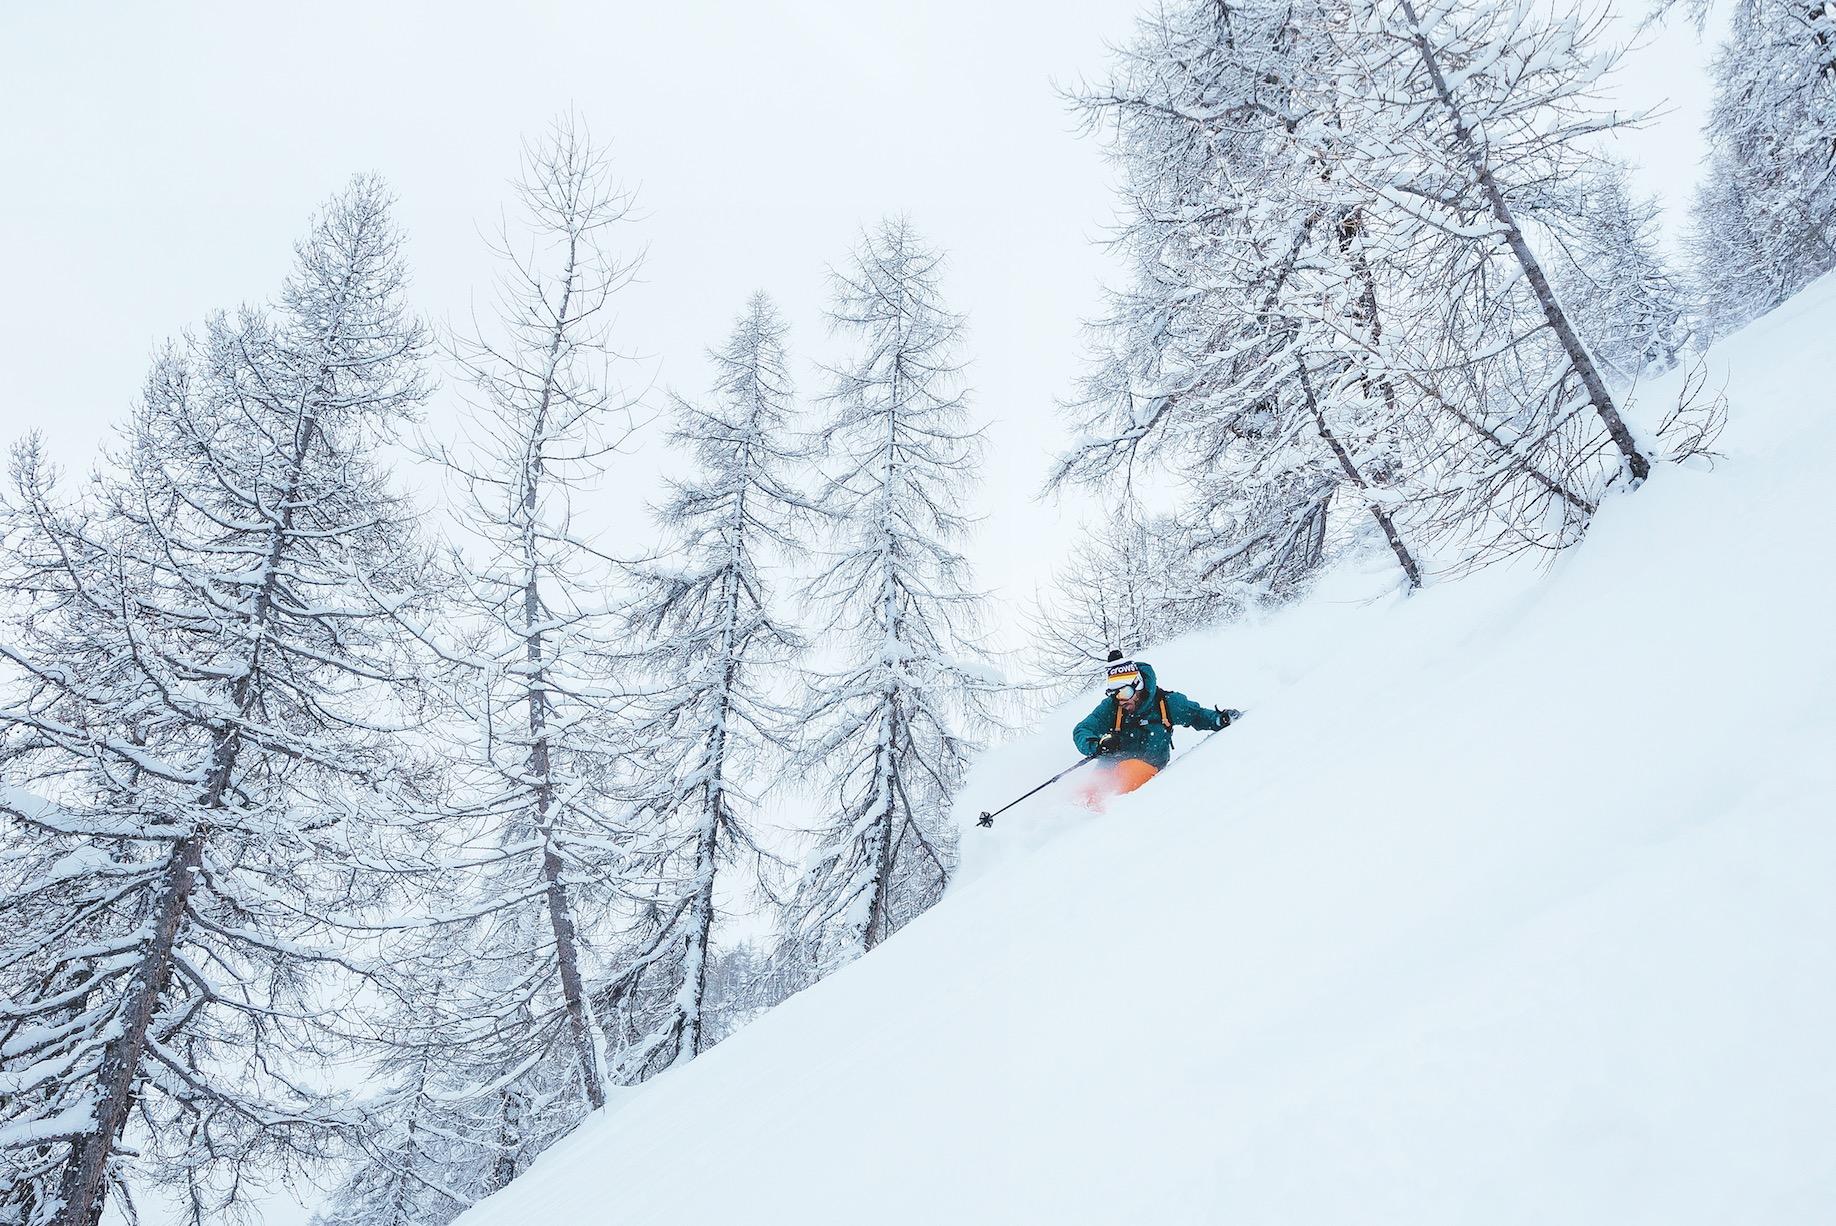 TVERRFAGLIG KOMPETANSE: Julien Regnier er sjef for Linecatcher og for skidesign i Black Crows. Her kombinerer han rollene ved å teste både ski og konkurranseforhold. Alle foto: Elina Sirpanta